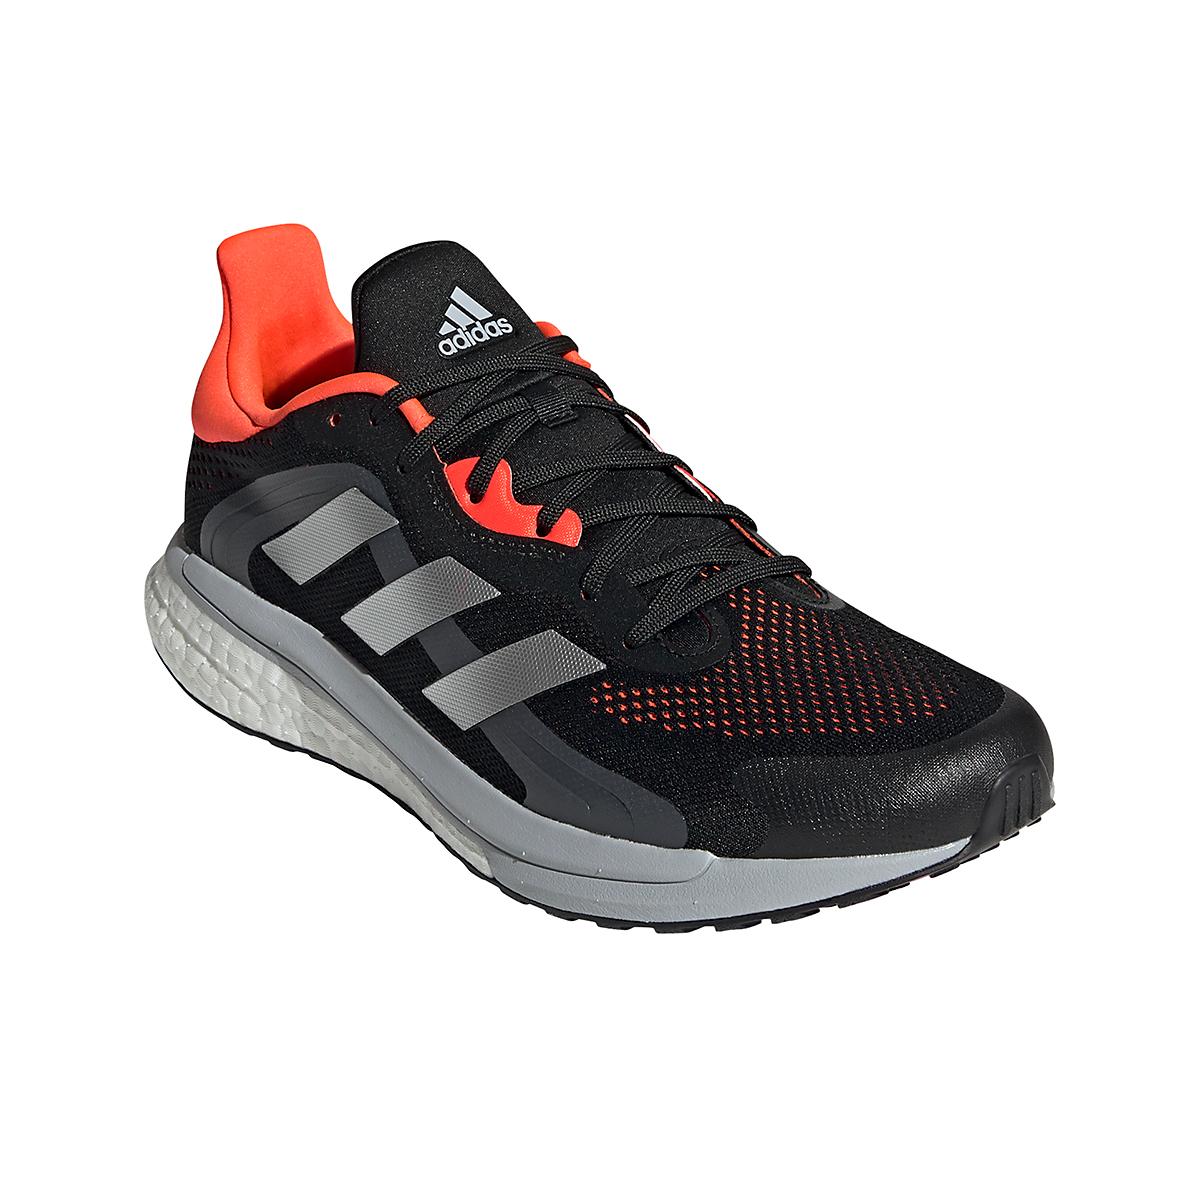 Men's Adidas Solar Glide 4 ST Running Shoe - Color: Core Black/Grey/Solar Red - Size: 6.5 - Width: Regular, Core Black/Grey/Solar Red, large, image 3